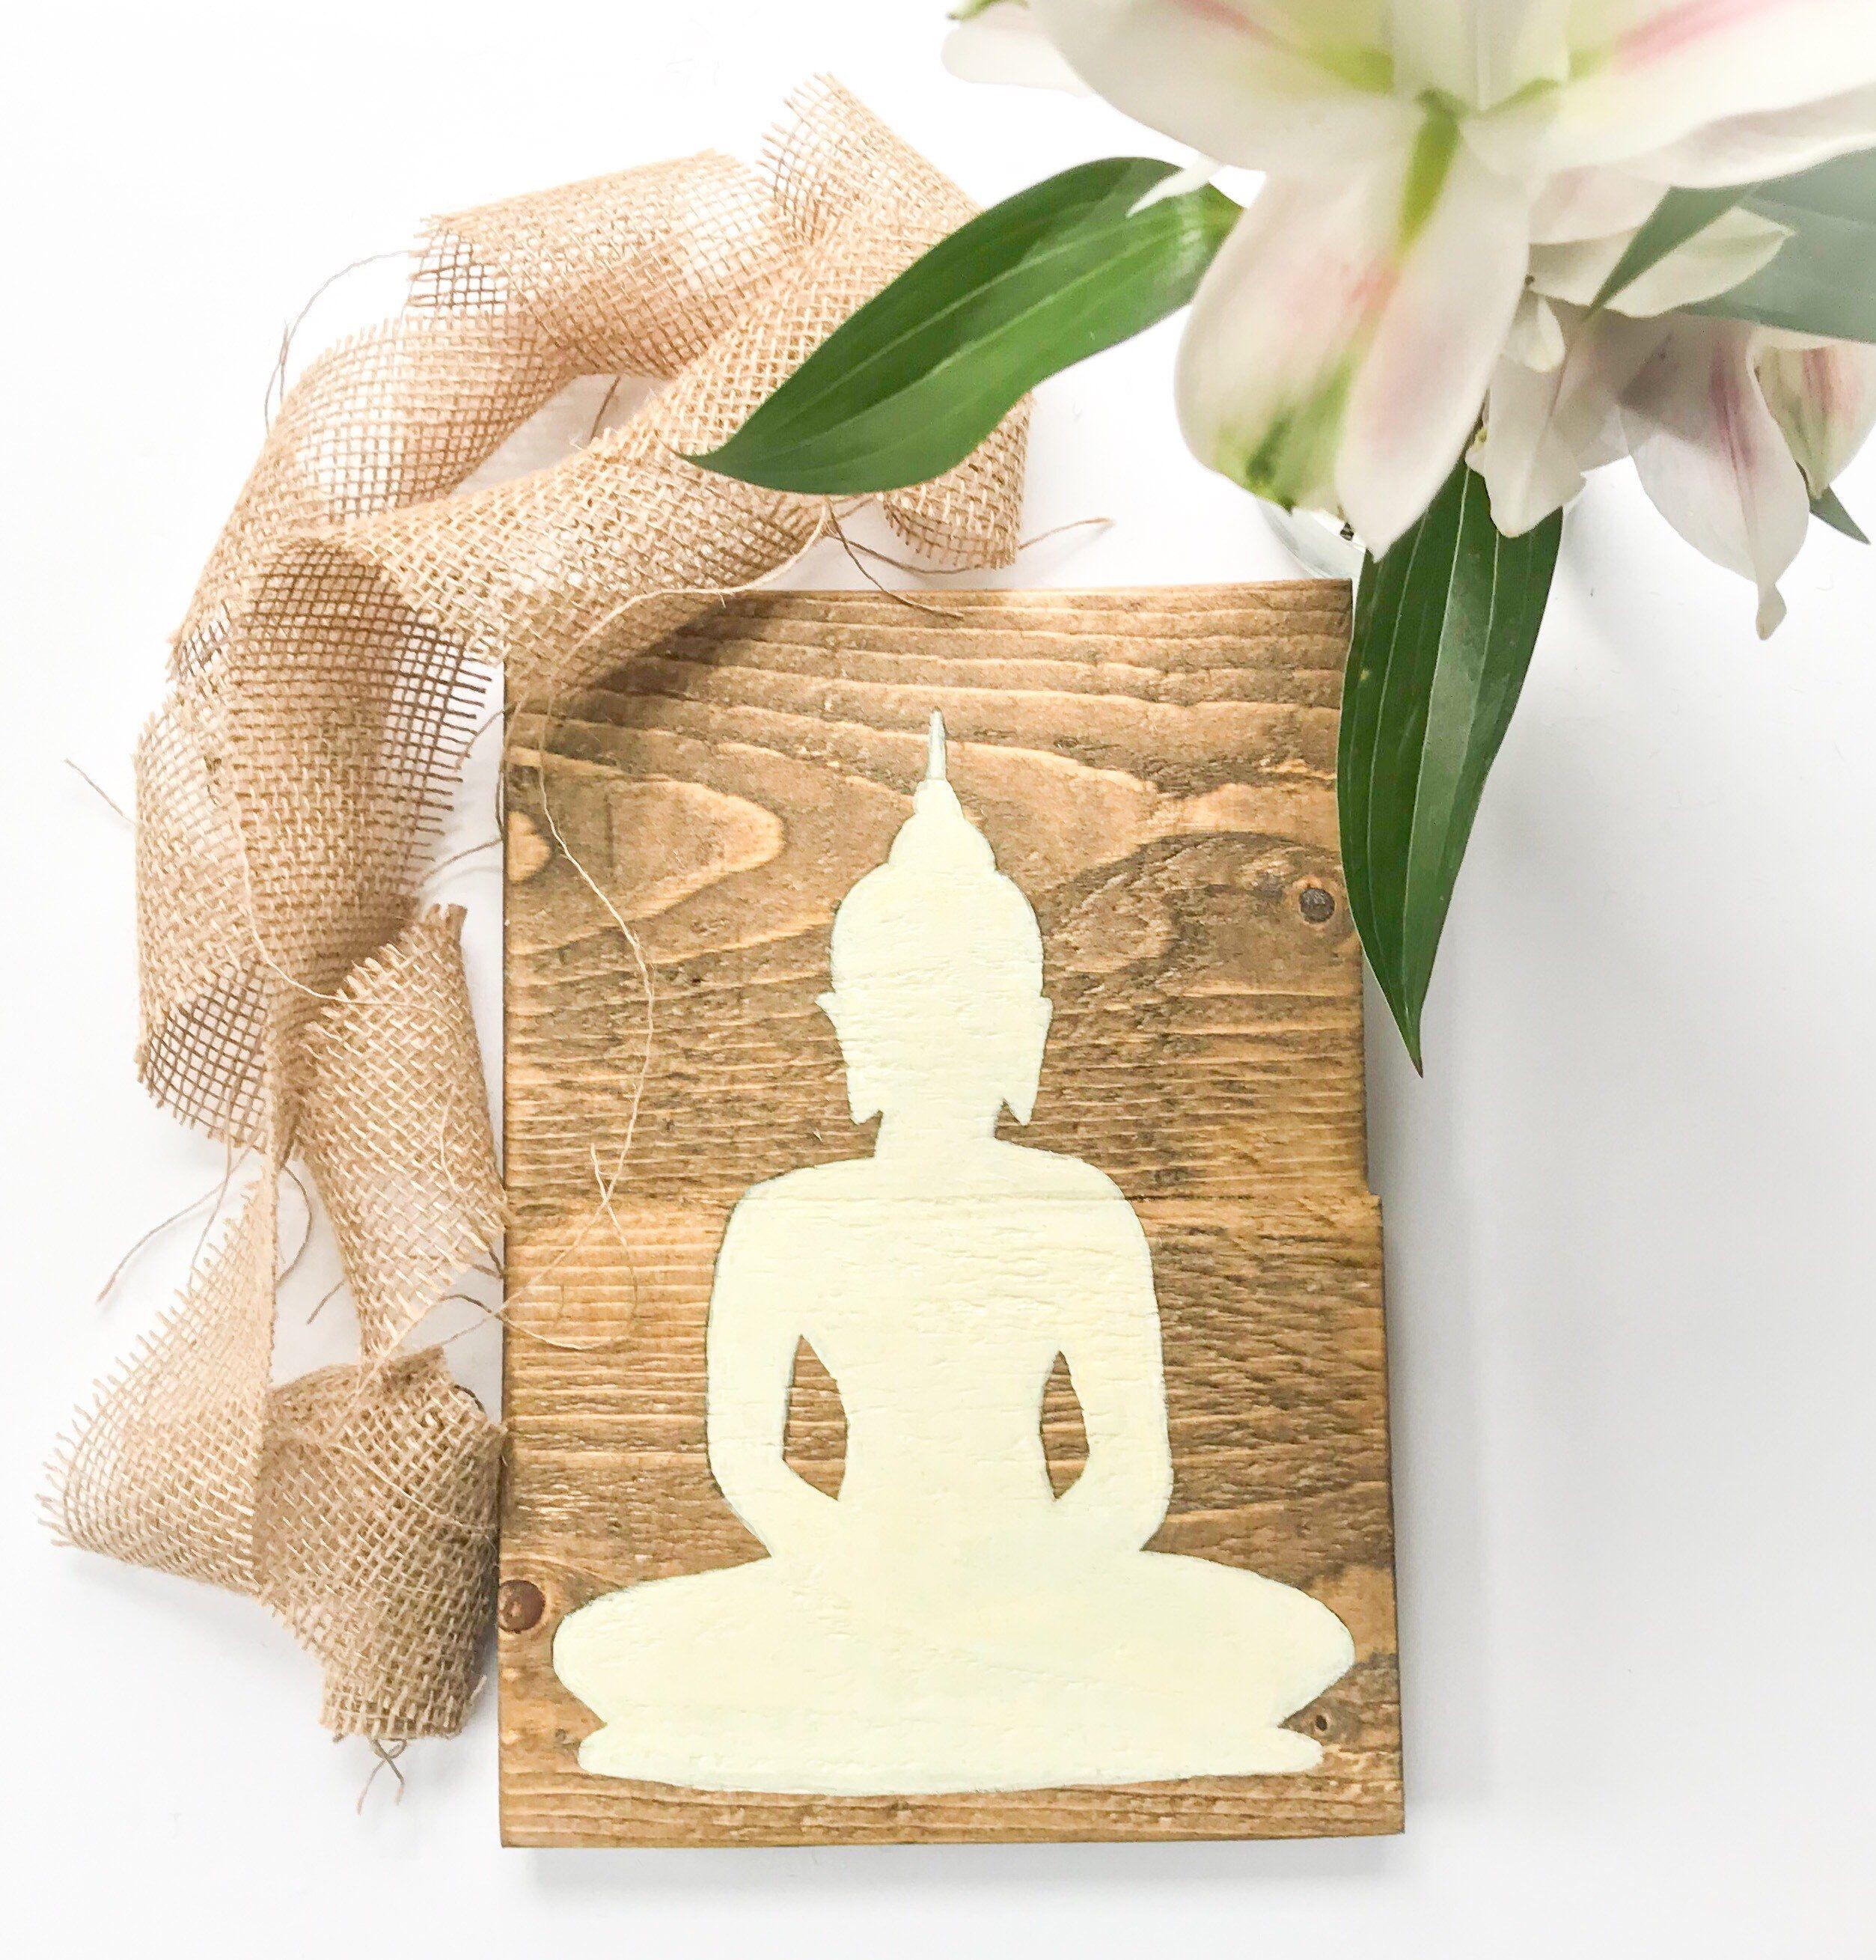 Rustic Wood Buddha Wall Decor Meditation Sign Handmade Sign Etsy Buddha Wall Decor Peace Wall Art Buddhist Decor